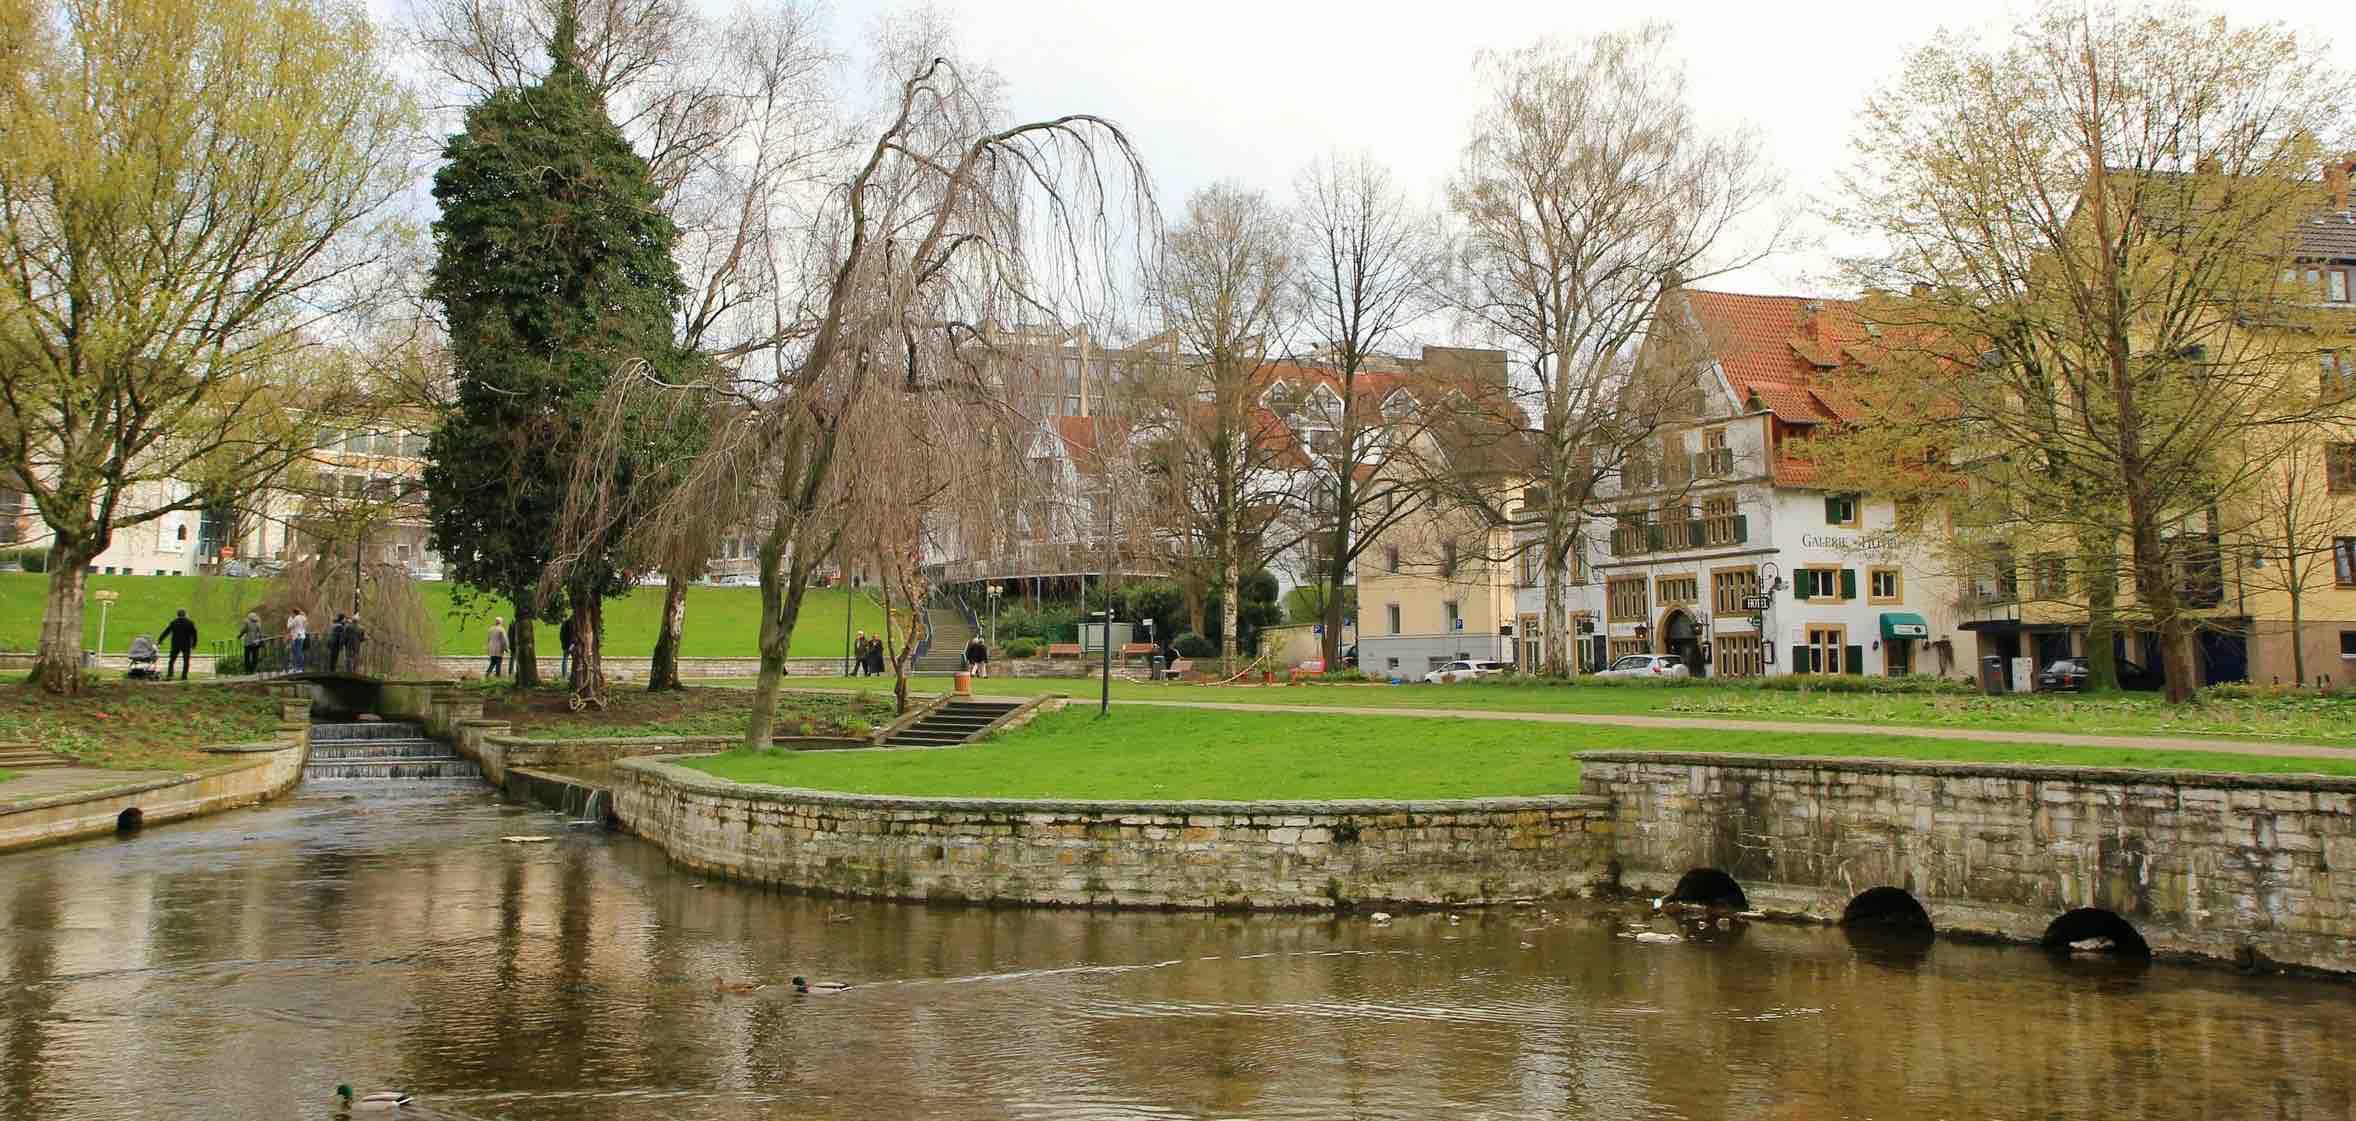 Unser Standort in Paderborn: itemis in Ostwestfalen - Preview image